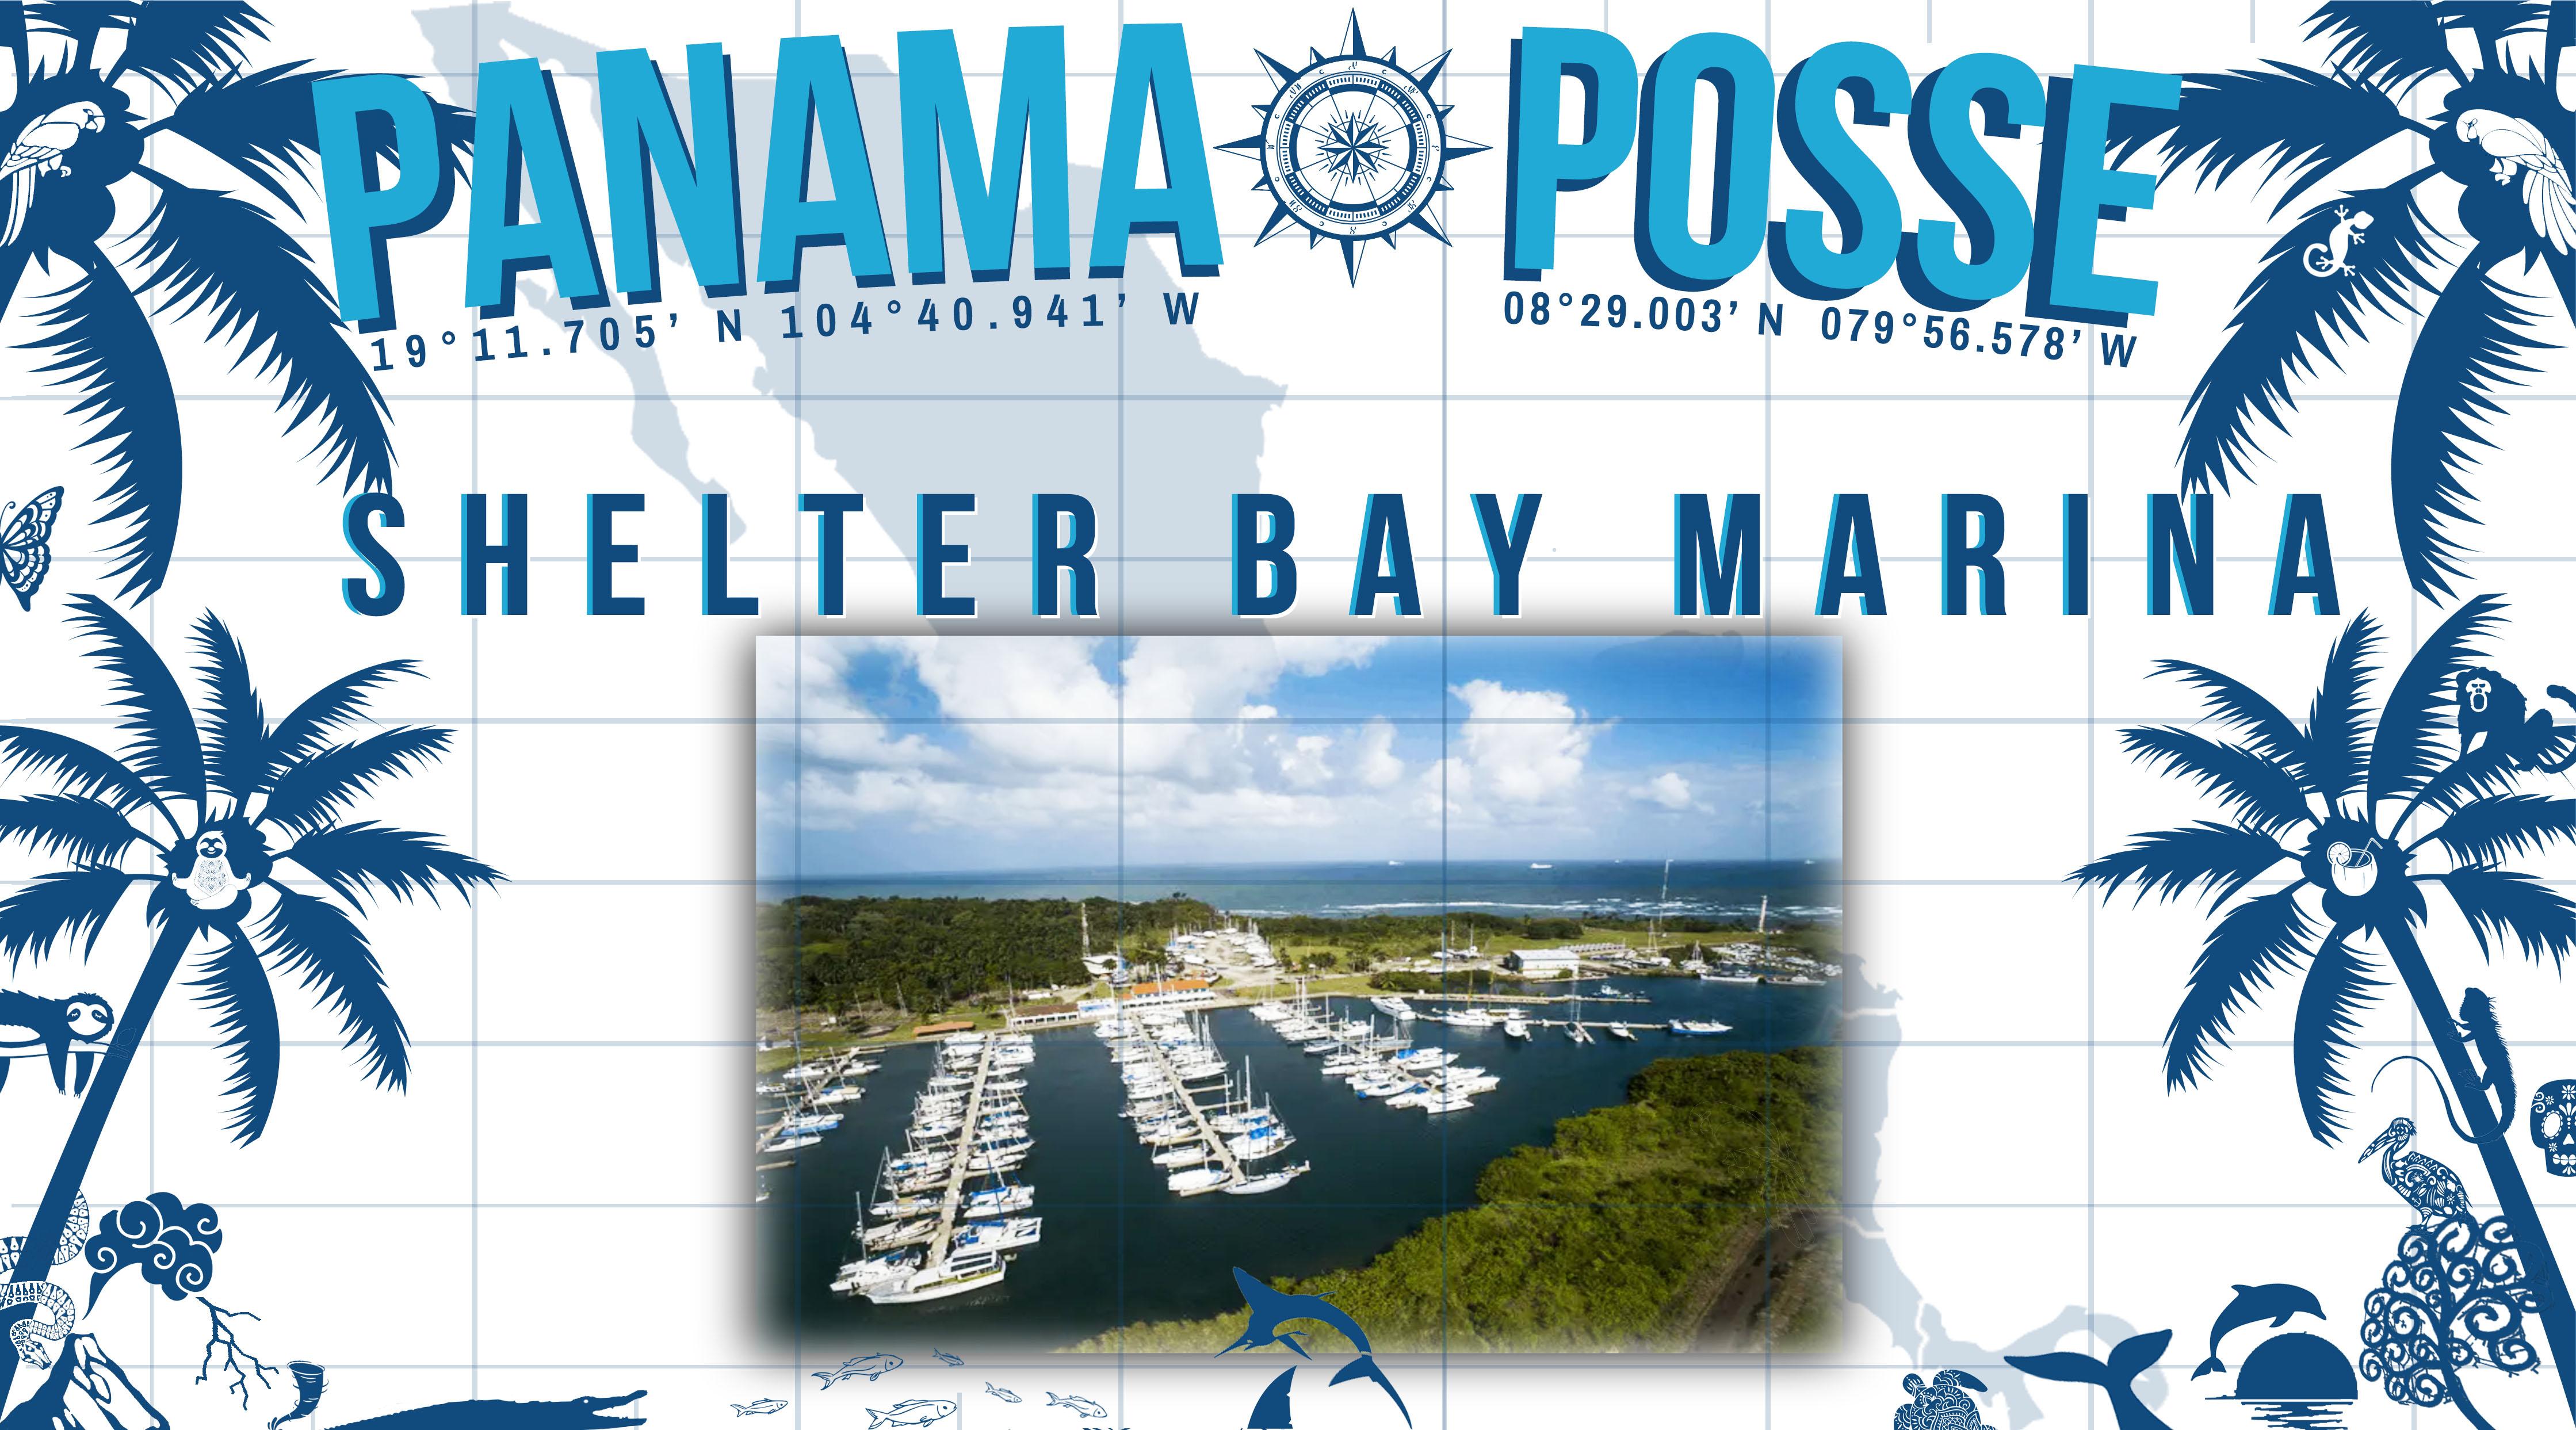 "SHELTER BAY MARINA PANAMA ""SPONSORS THE PANAMA POSSE 20·21"